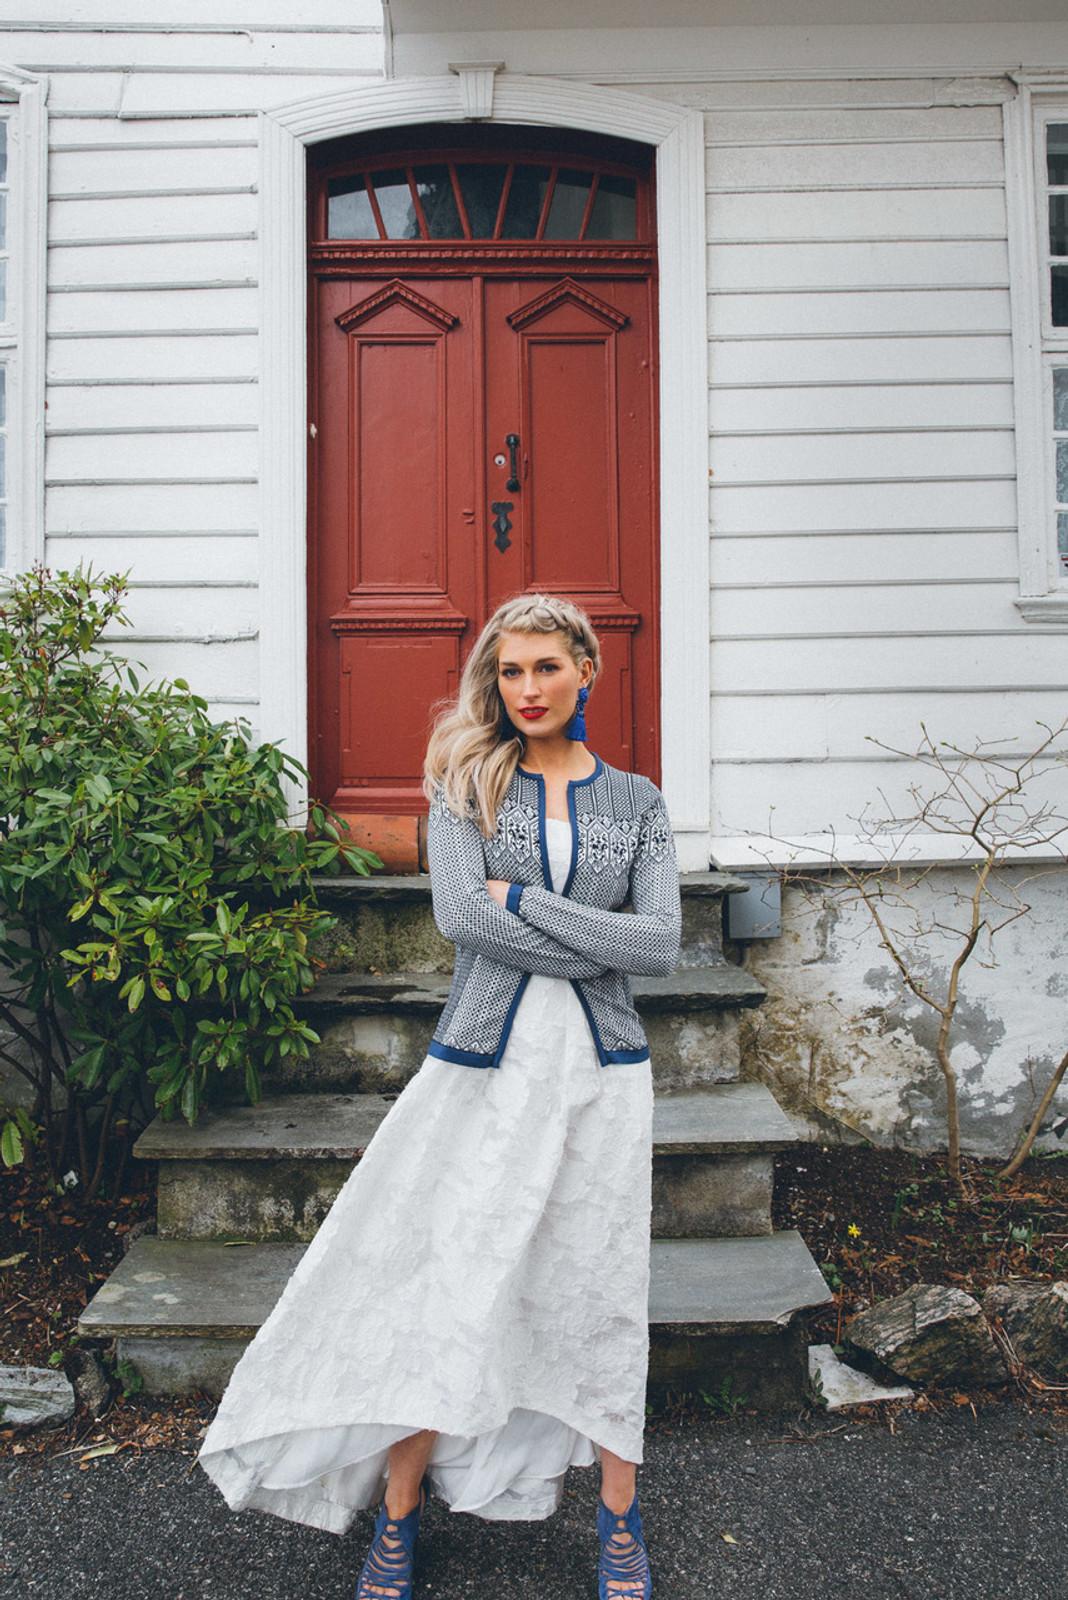 Woman in front of door wearing Dale of Norway Sigrid ladies cardigan in Navy/Off White/Indigo, 82071-C